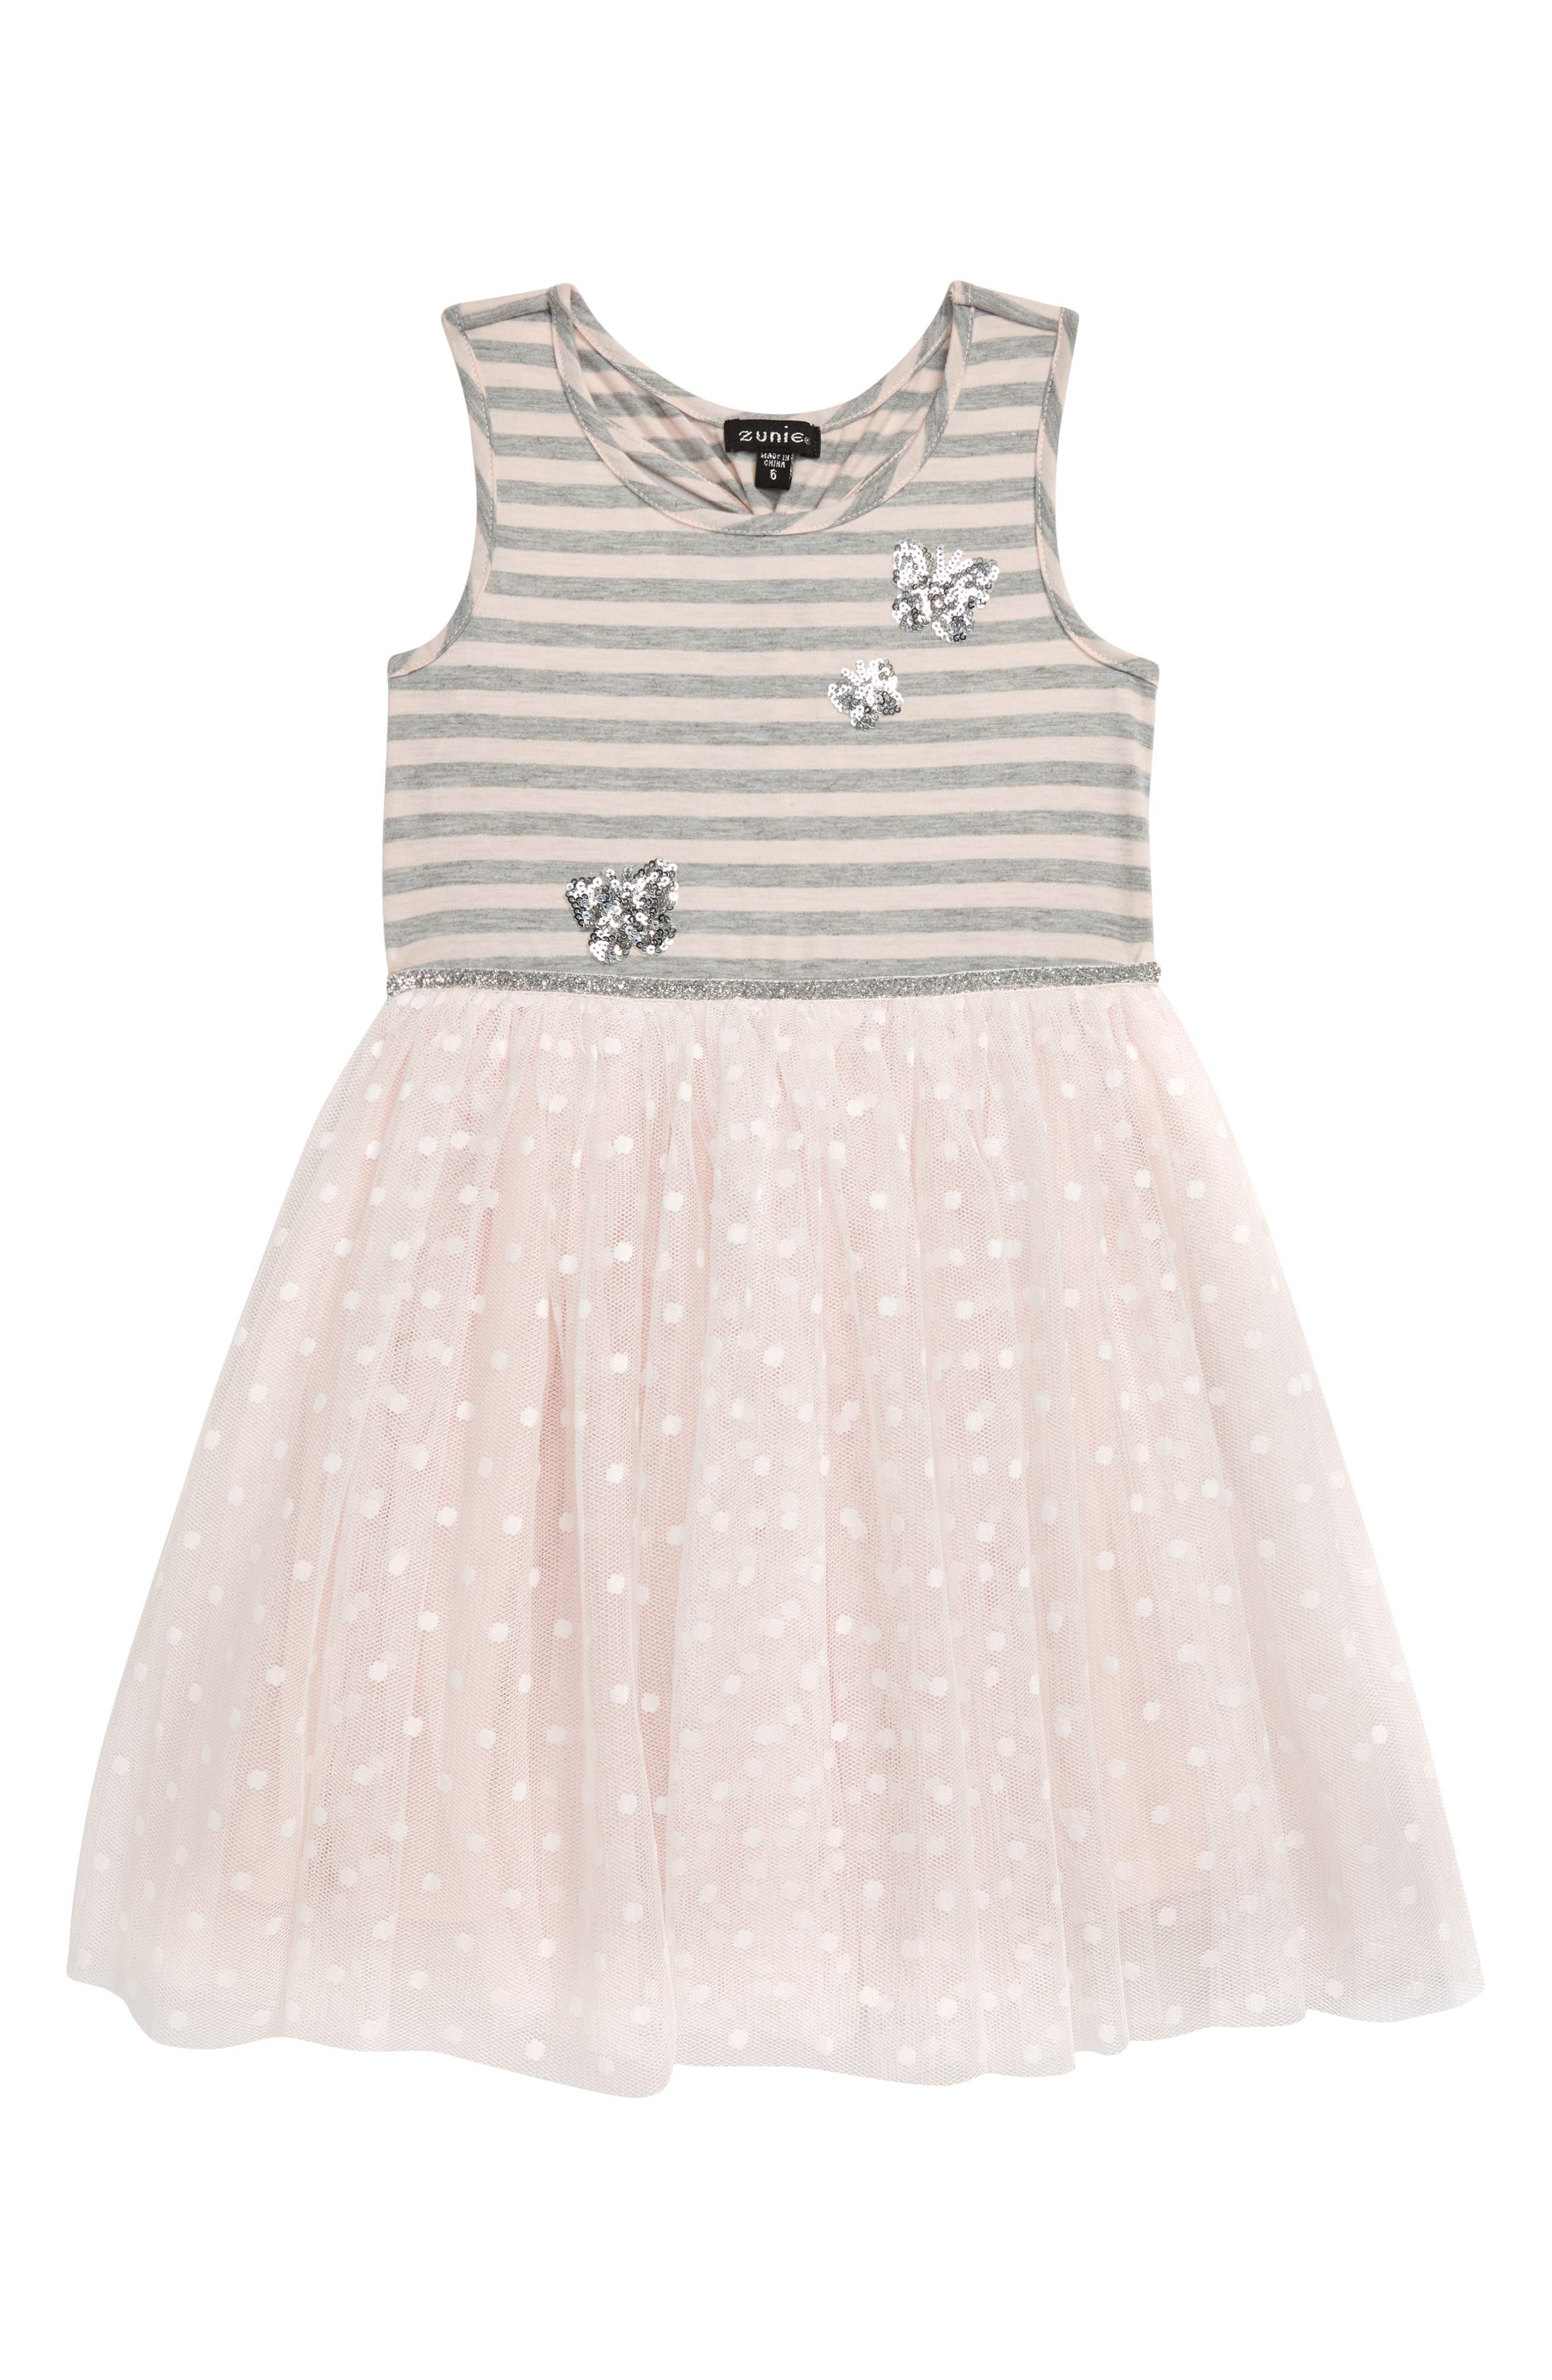 Toddler Girls Zunie Sequin Applique Mixed Media Dress Size 3T  Grey